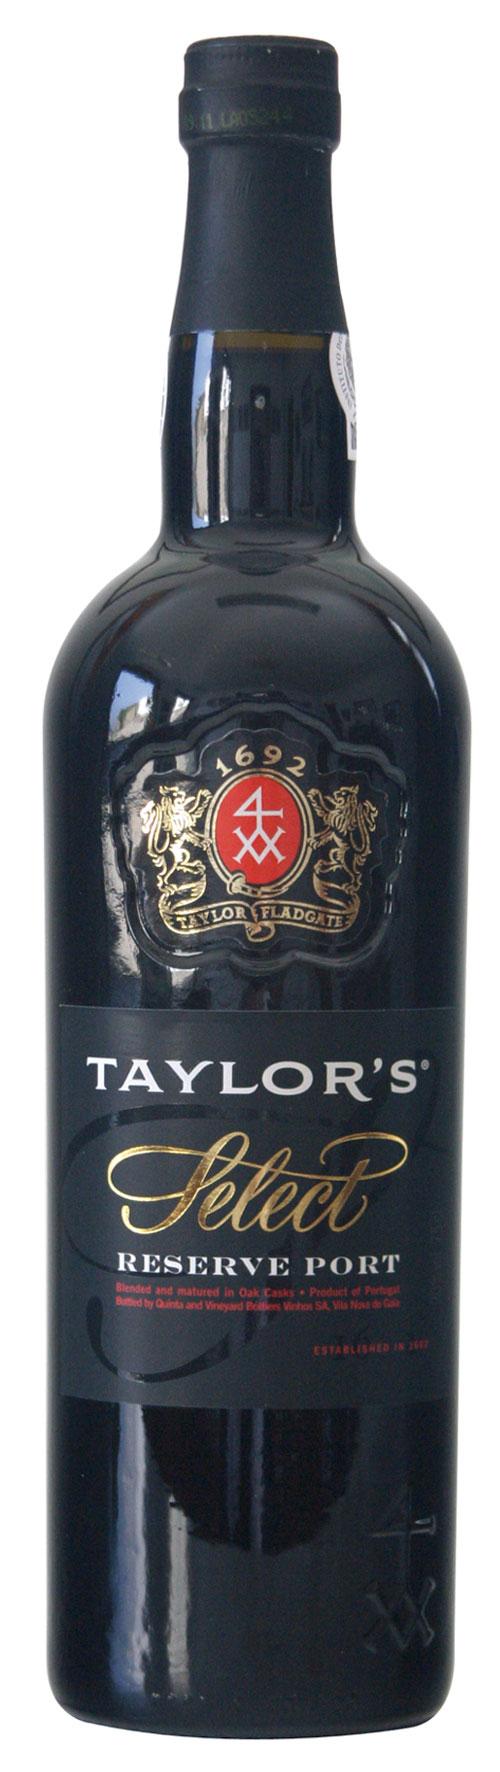 Taylor's Select Reserve Port